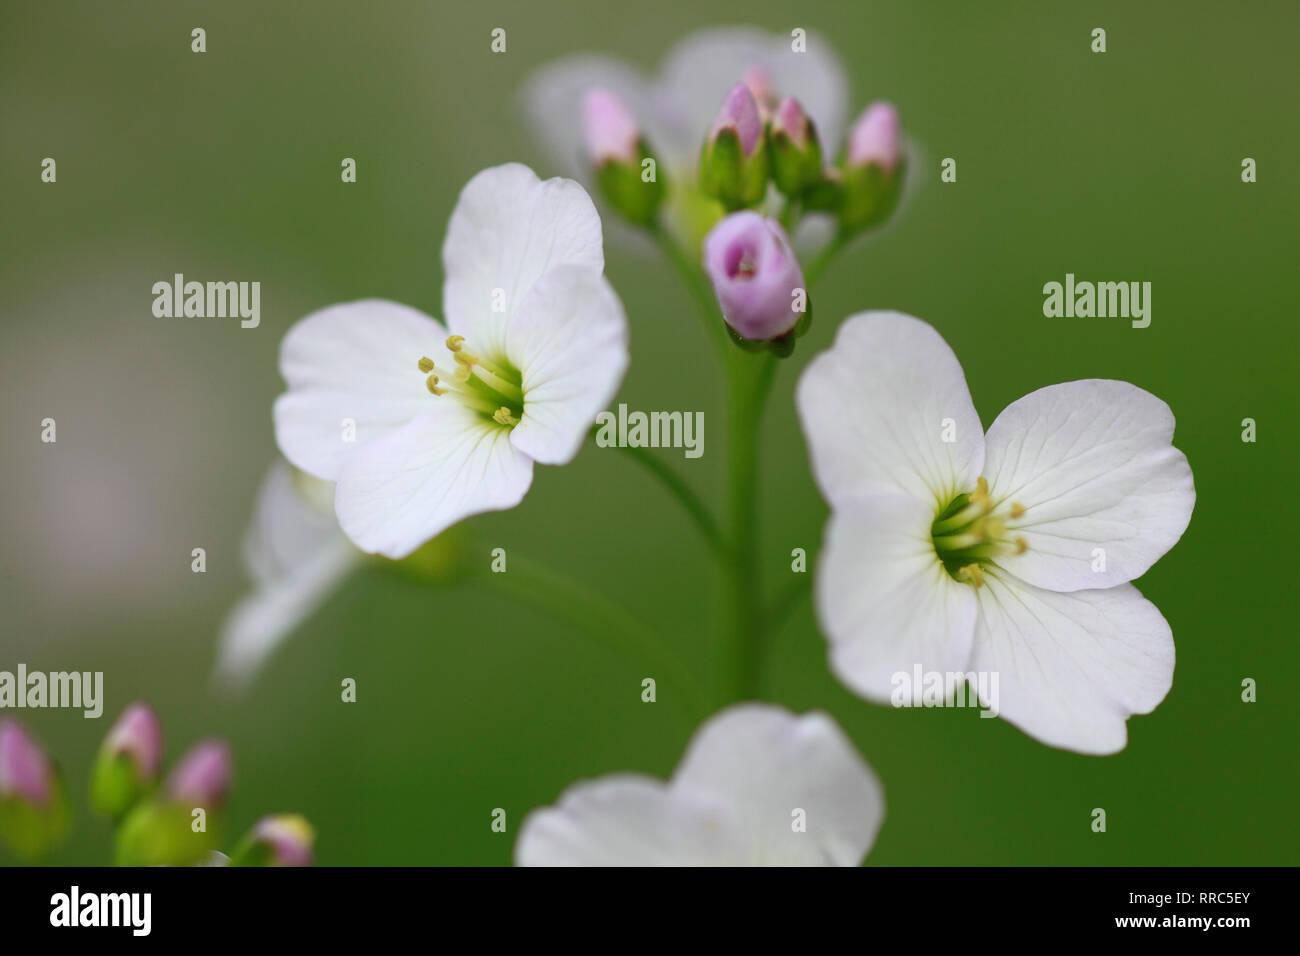 botanik wiesenschaumkraut cardamine pratensis wiesenschaumkraut schweiz additional rights clearance info not available